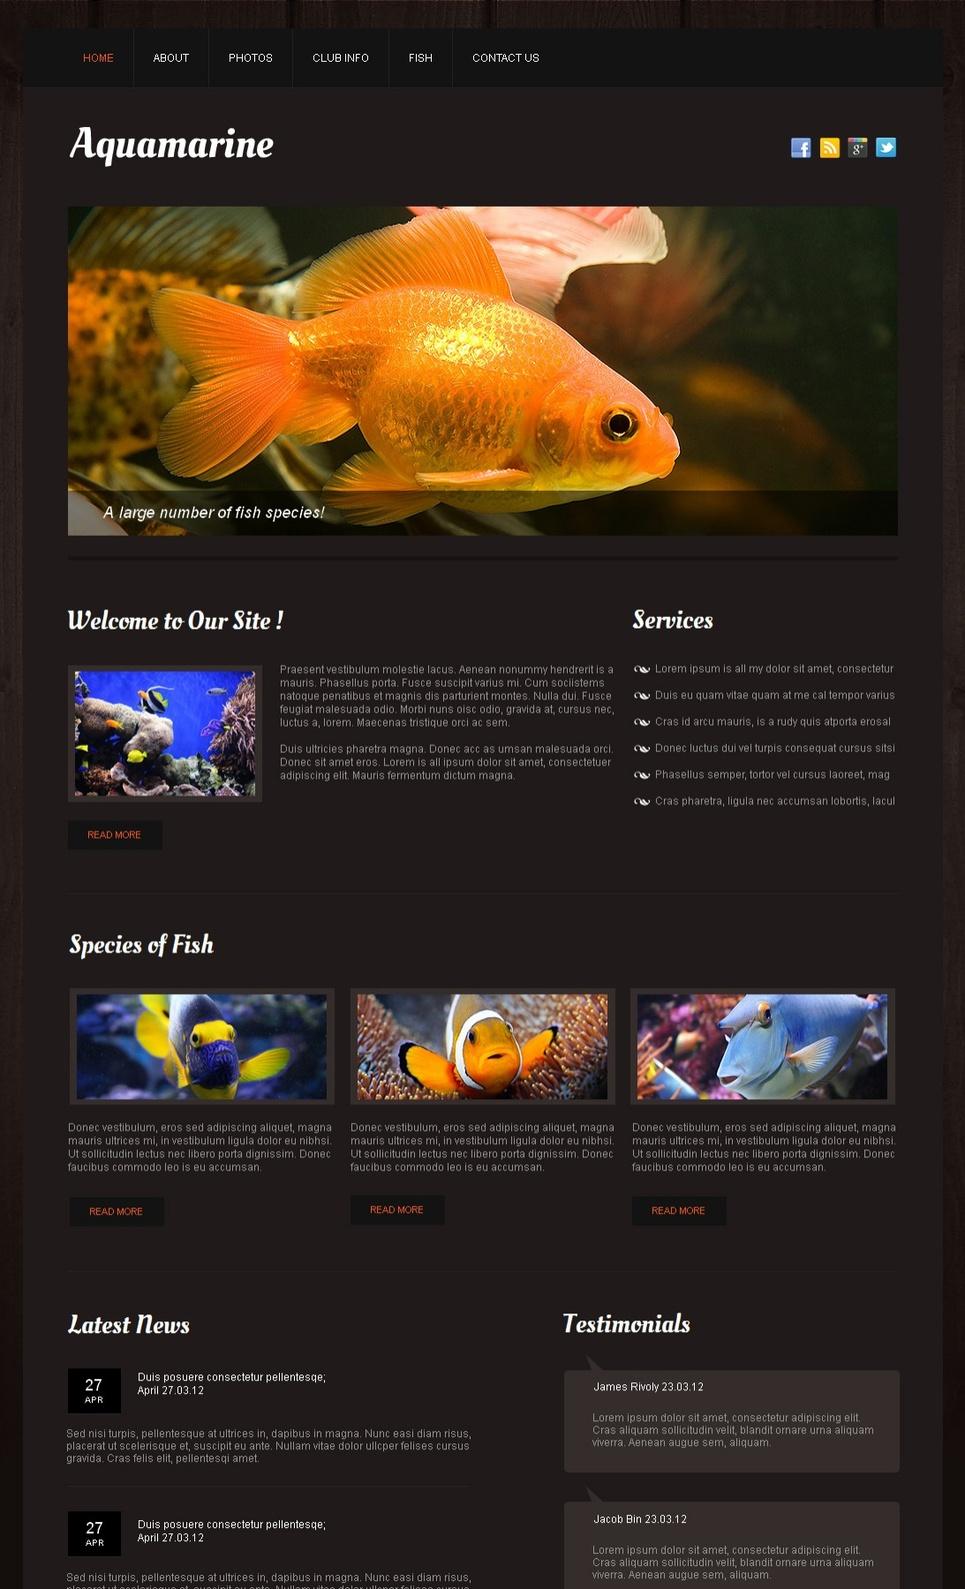 Aquarium Fish Website Template with Photo Gallery - image